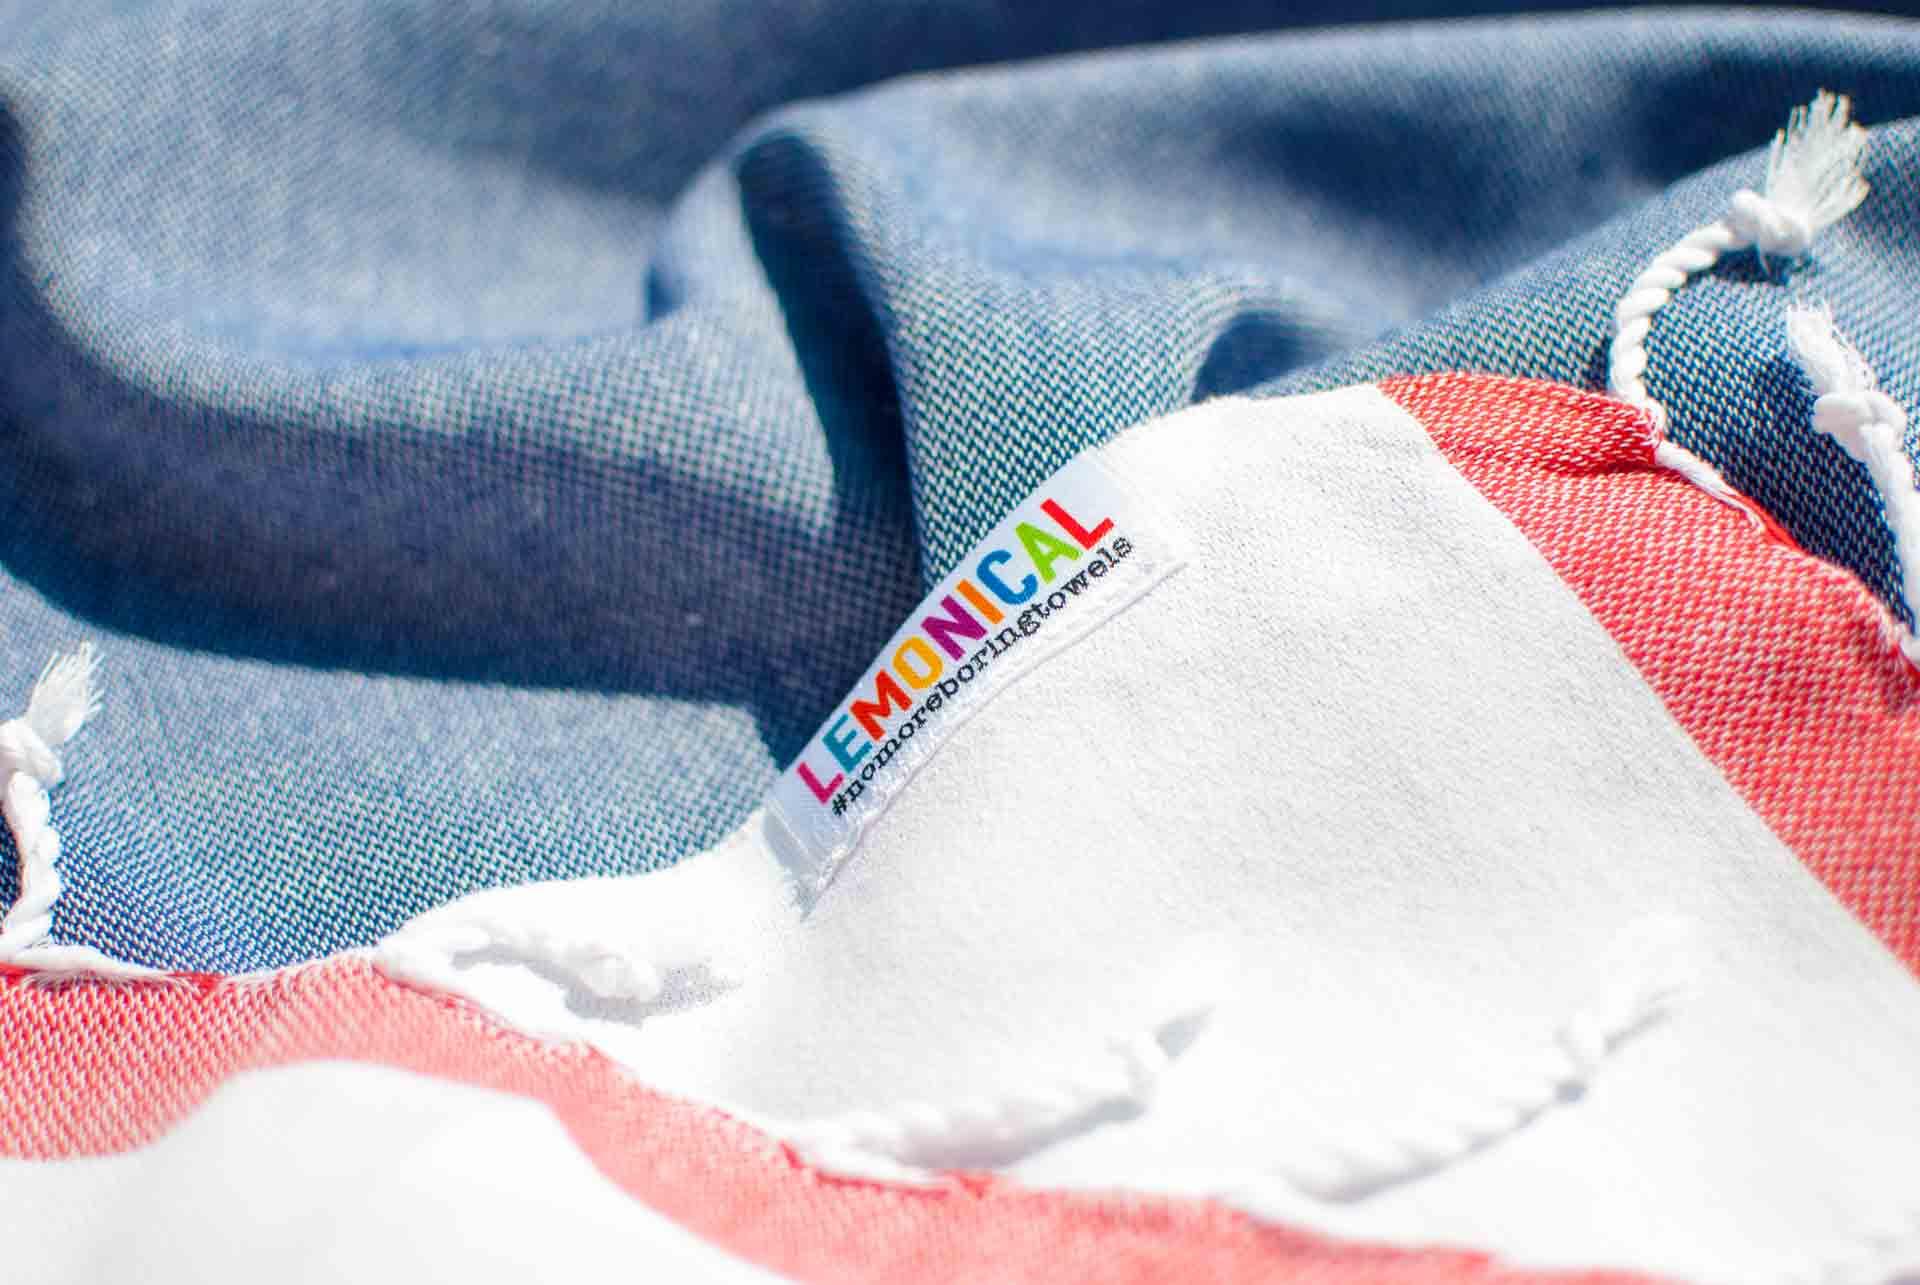 Toucan Towel as a Gift